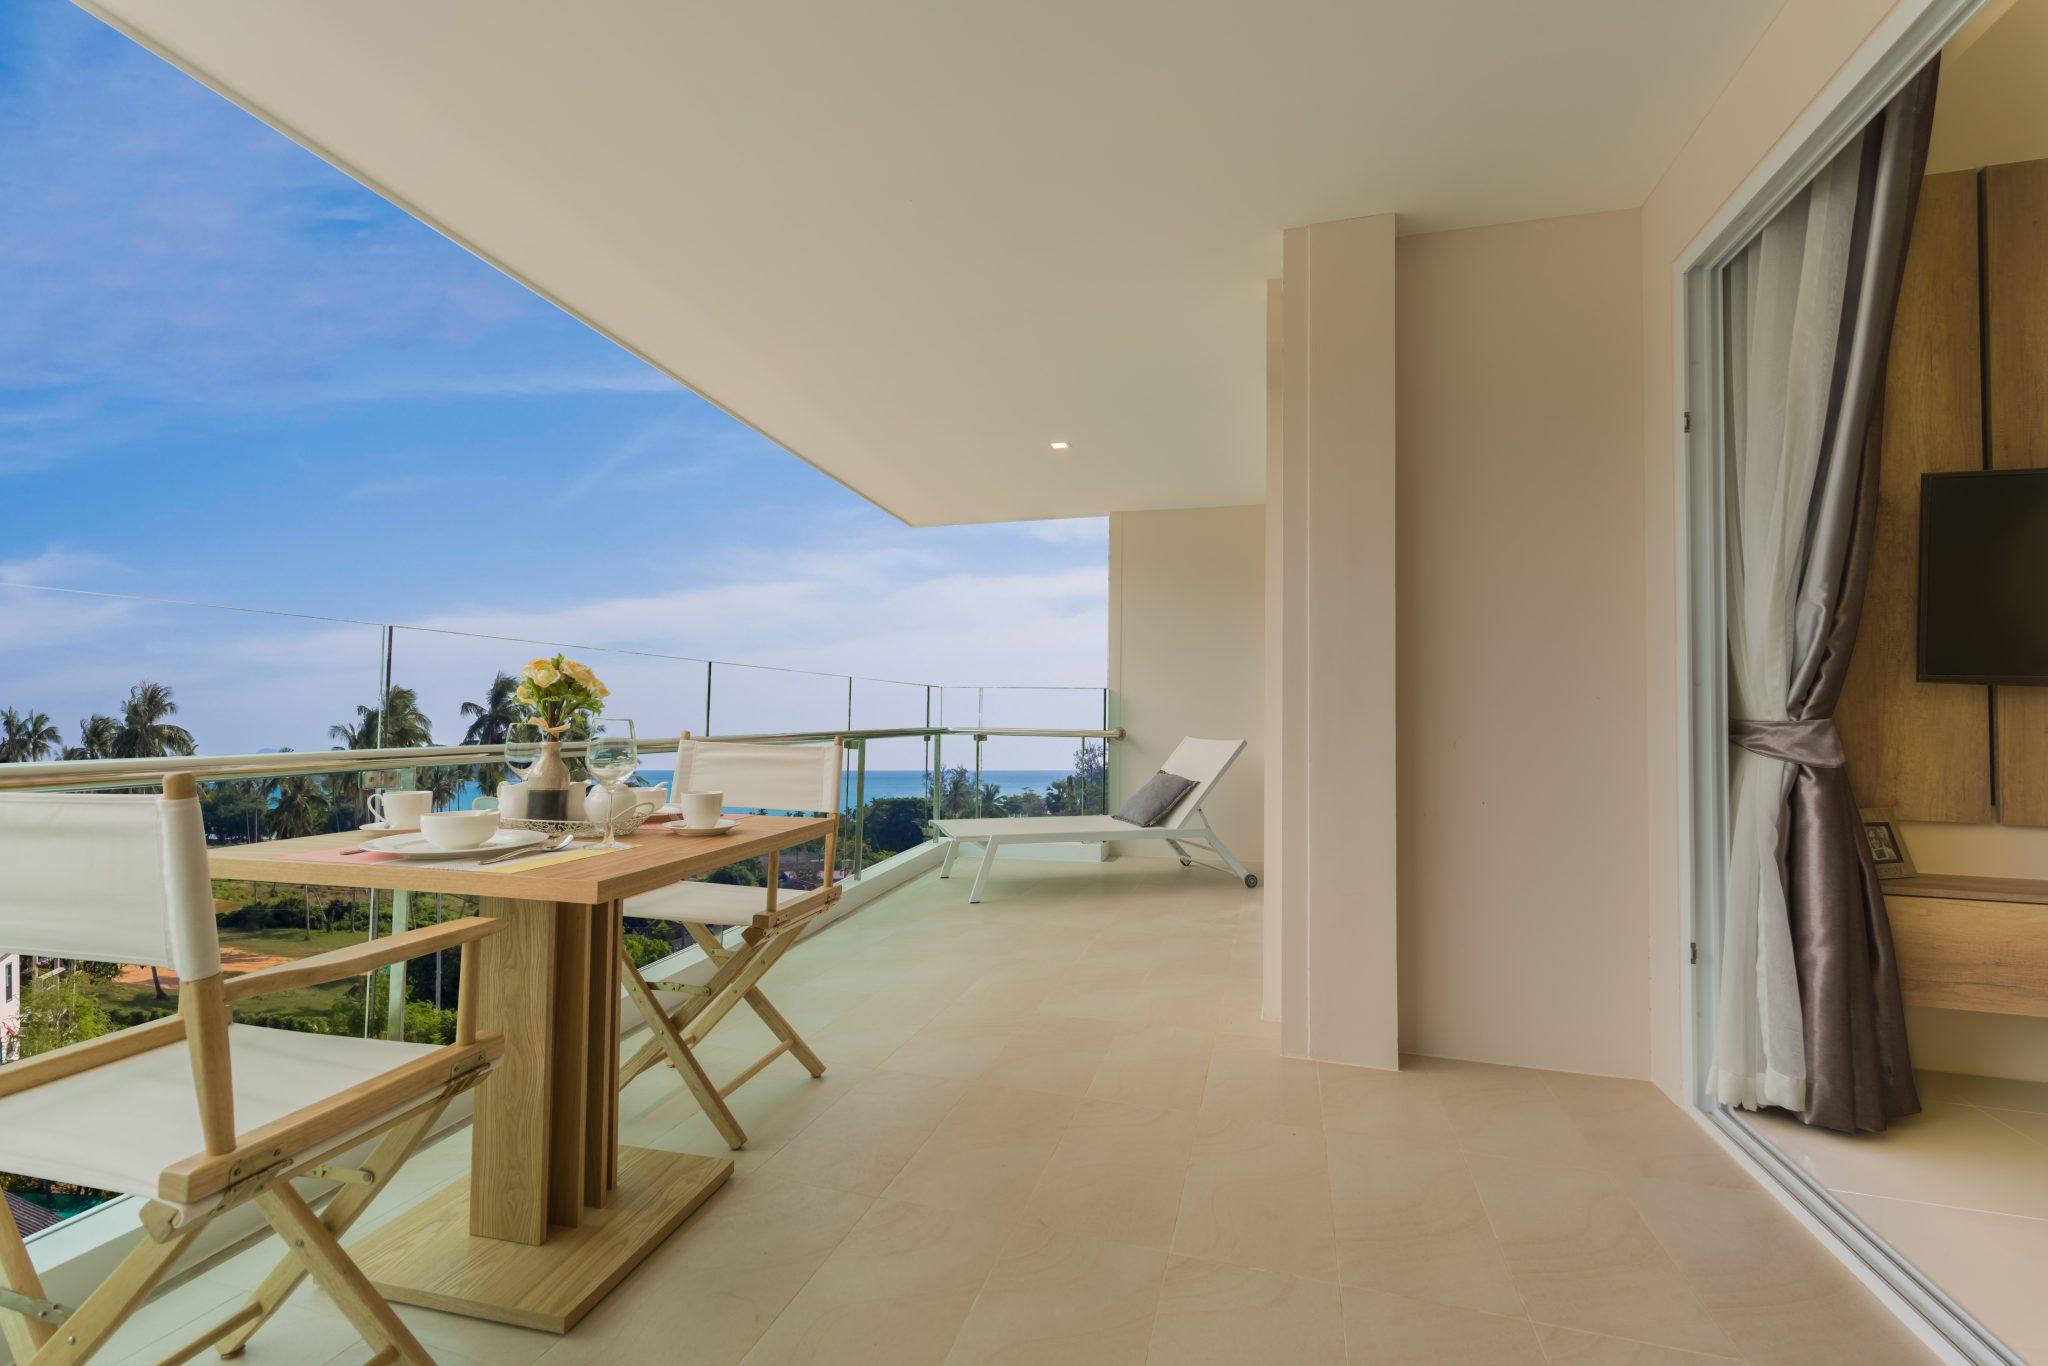 Phuket Real Estate Agency – Rawai Beach (6)